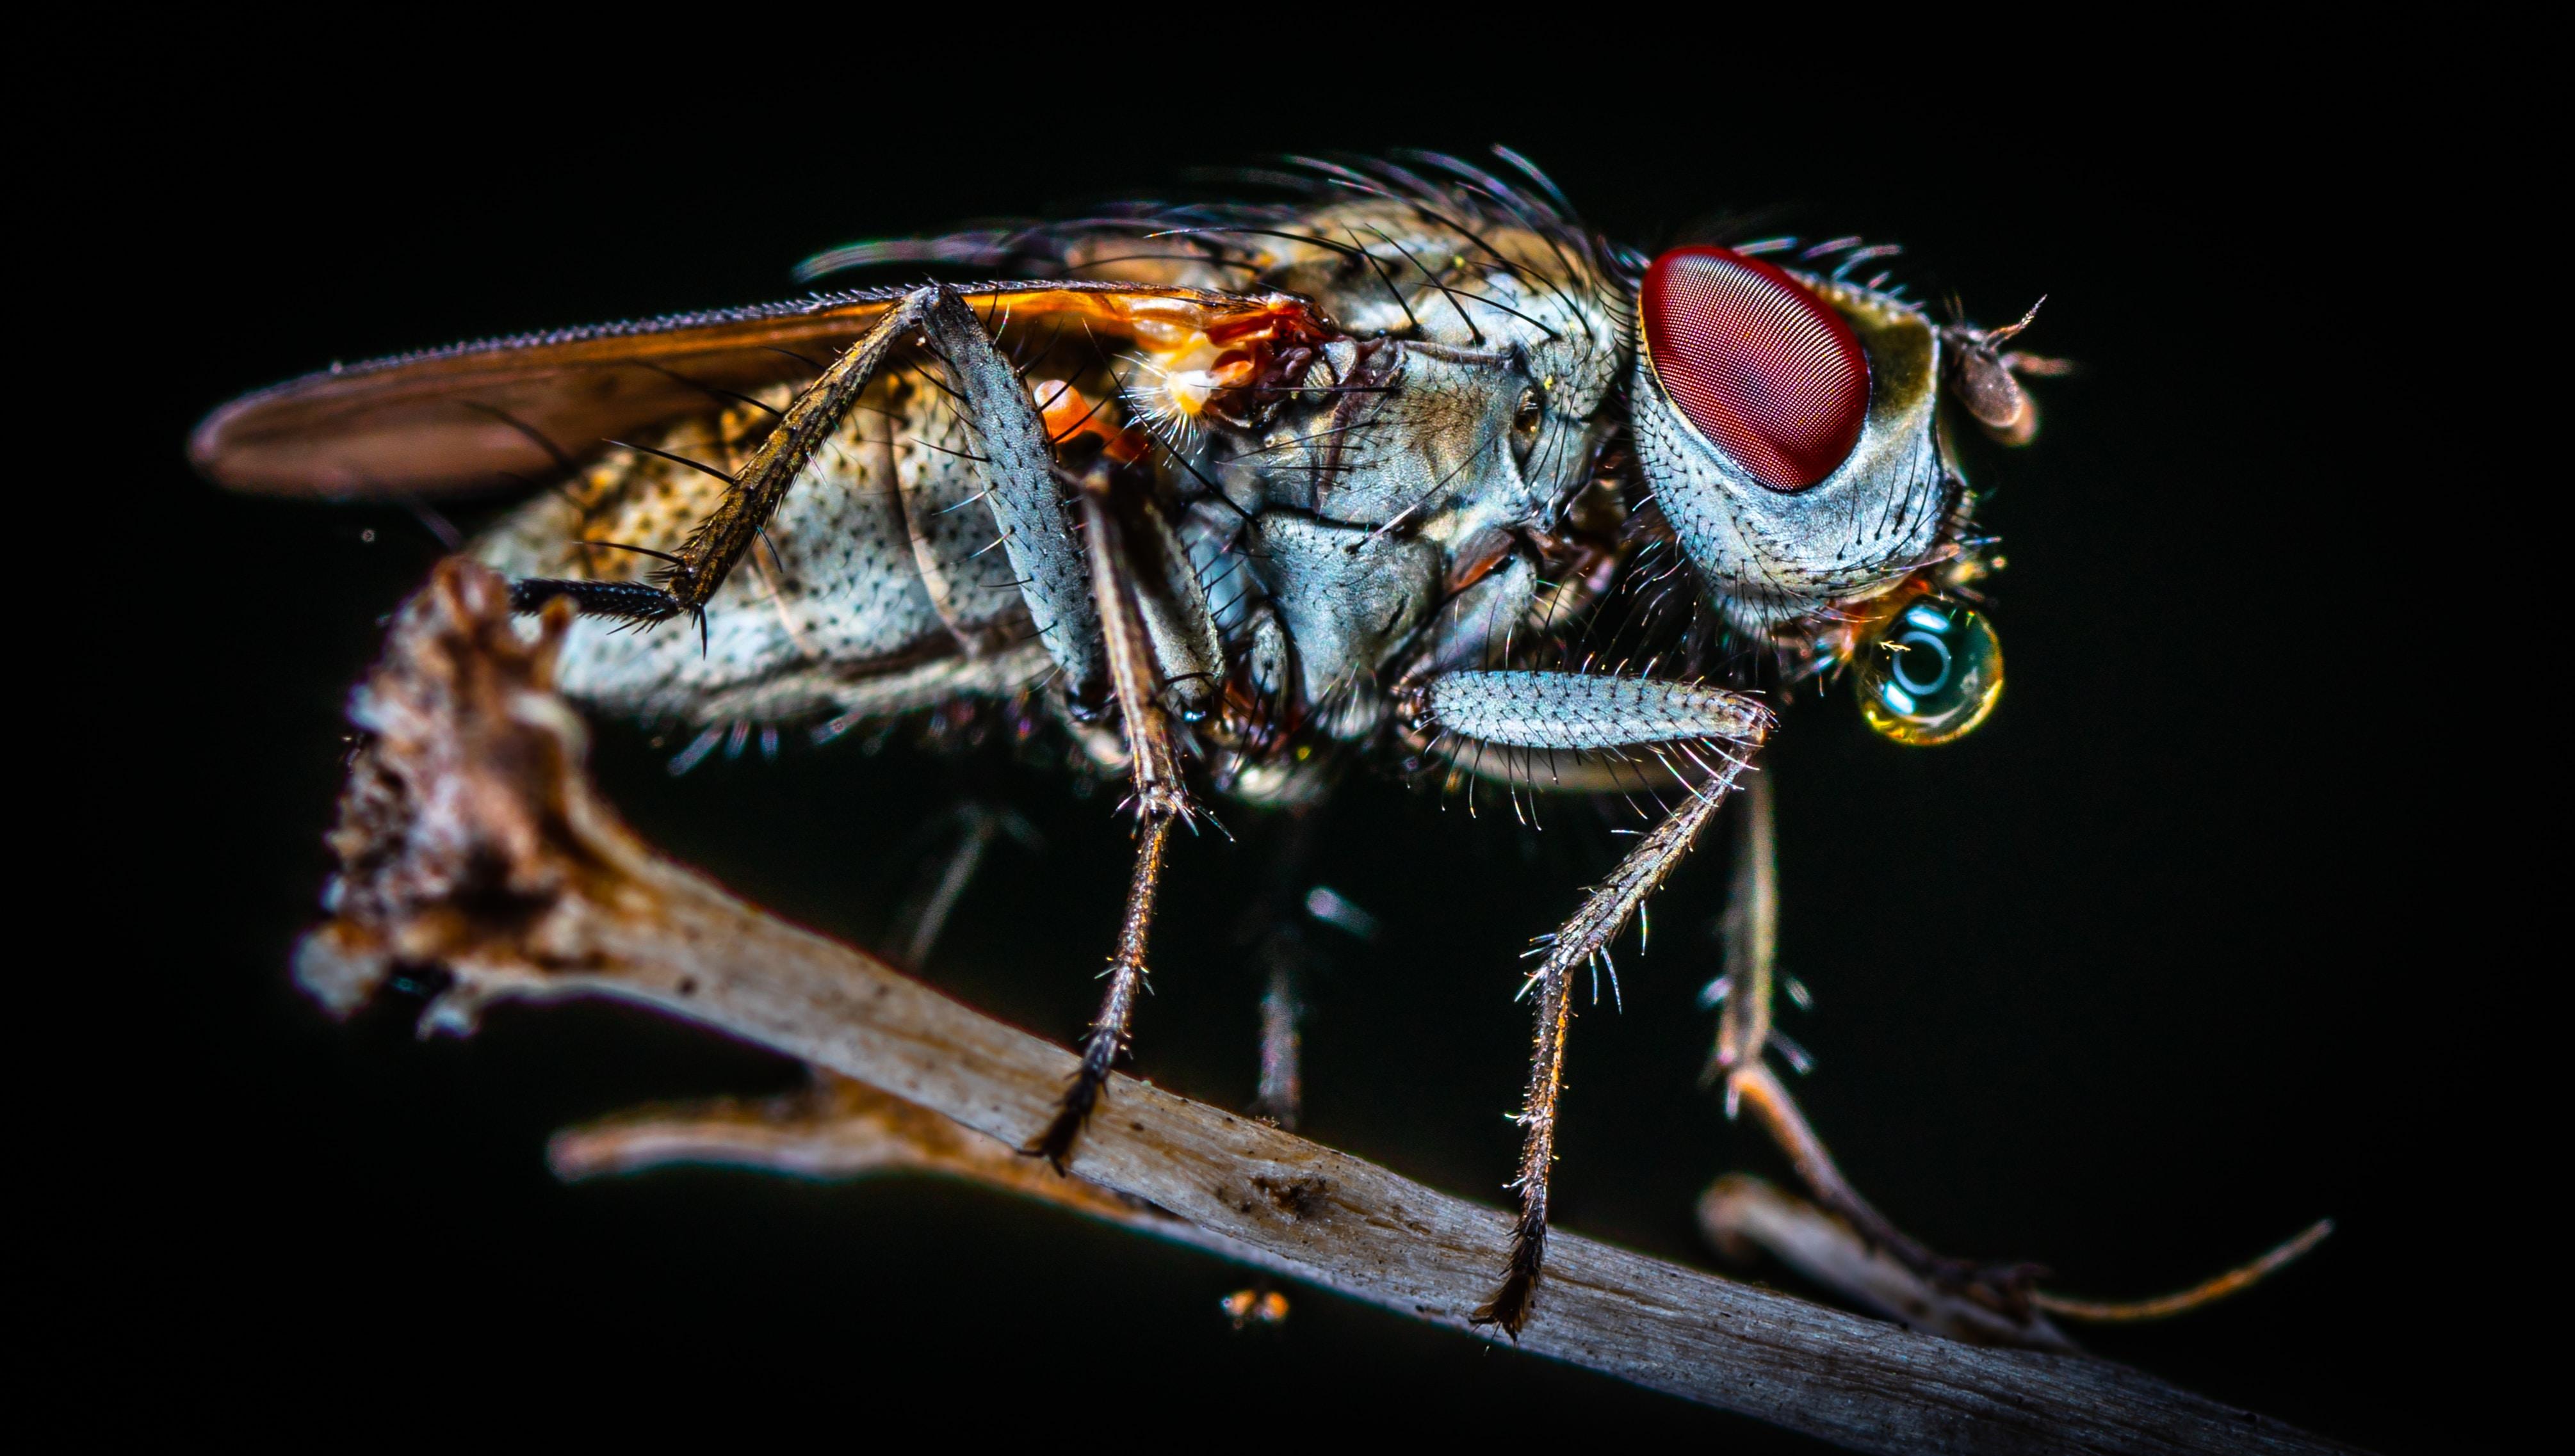 closeup photo of fly